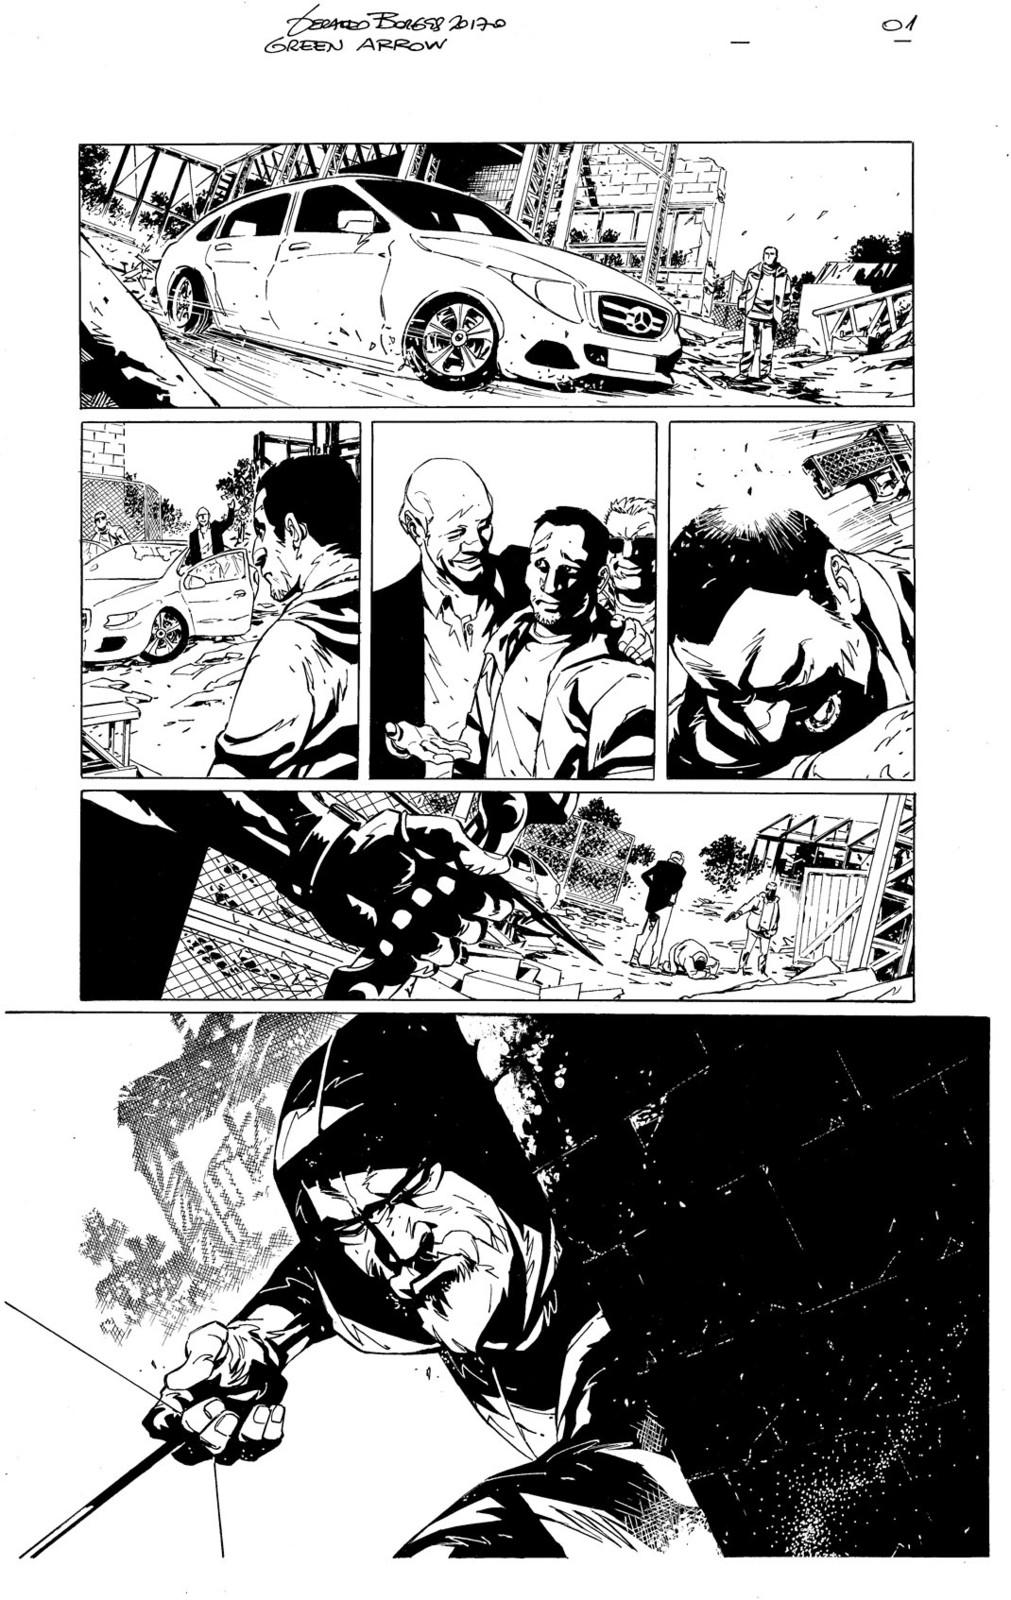 Green Arrow sample page 01